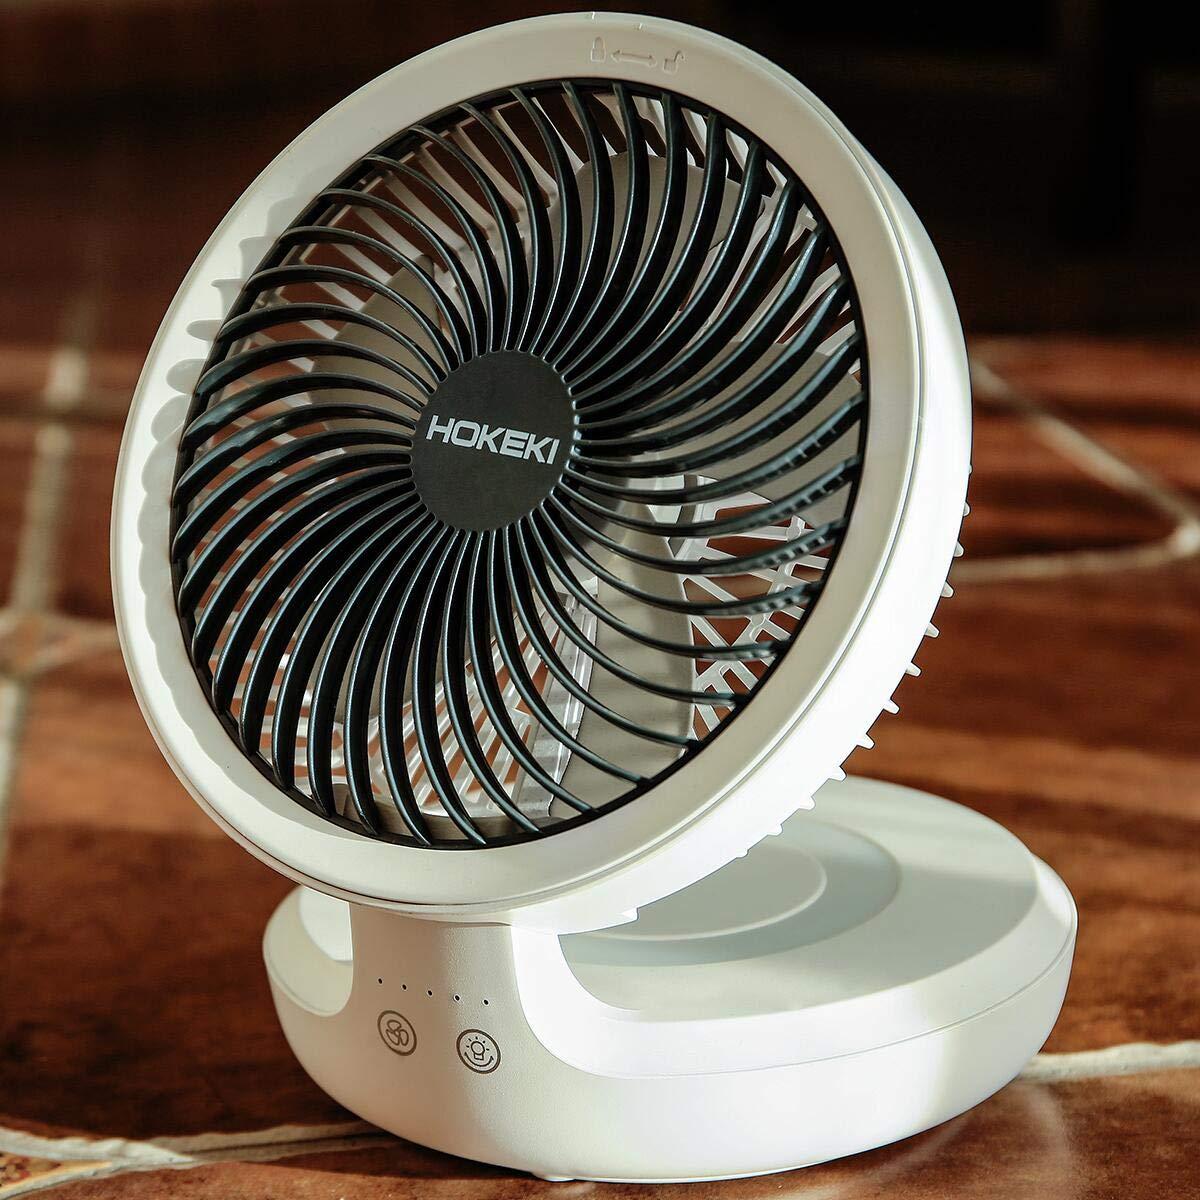 HOKEKI USB Desk Fan with Night Breathing Light, Air Circulator Desk Fan 90 Degree Rotation Portable Foldable Fan for Home, Office, Travel, Camping, Outdoor, Indoor Fan, 4 Speed Setting, White